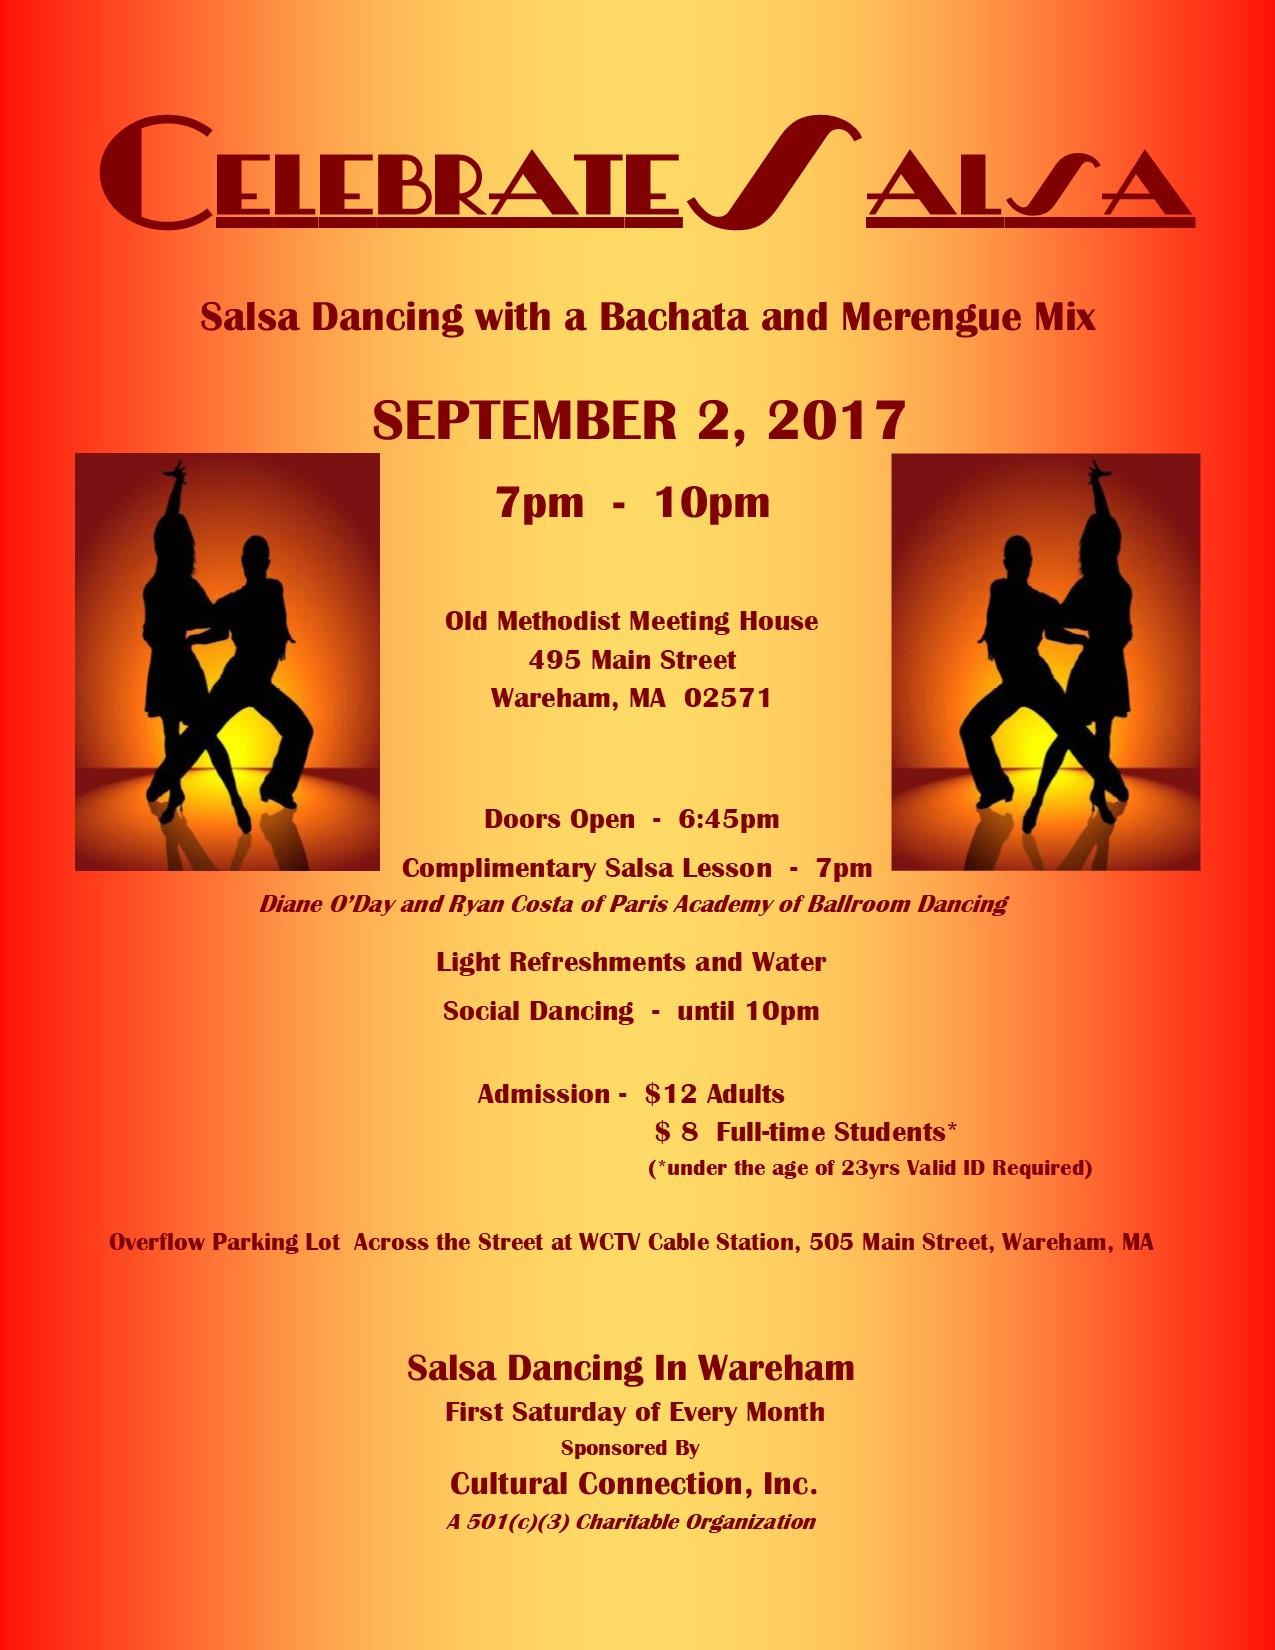 Celebrate Salsa Dance - September 2, 2017